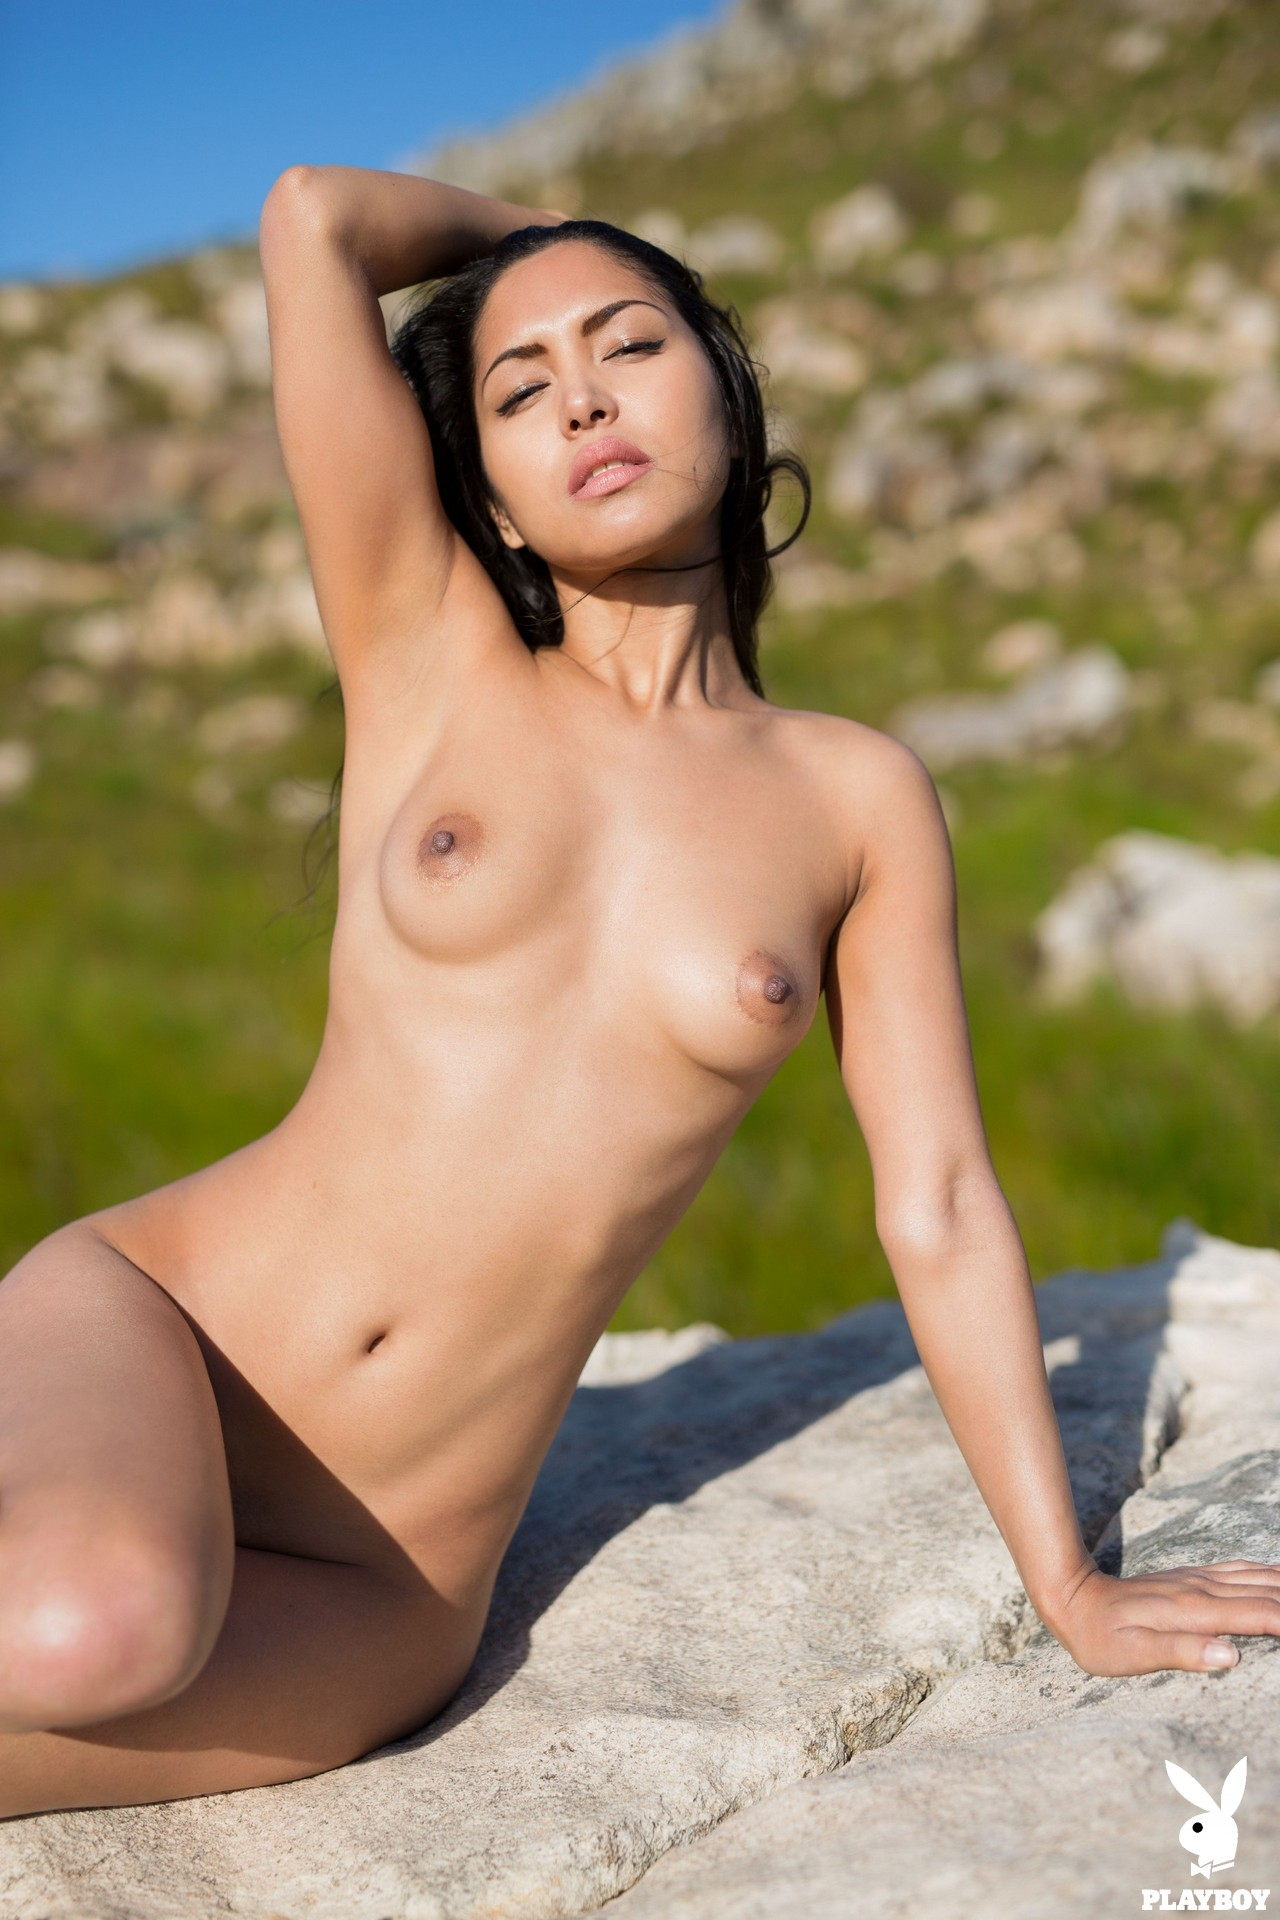 Chloe Rose in Trail Blazing 33